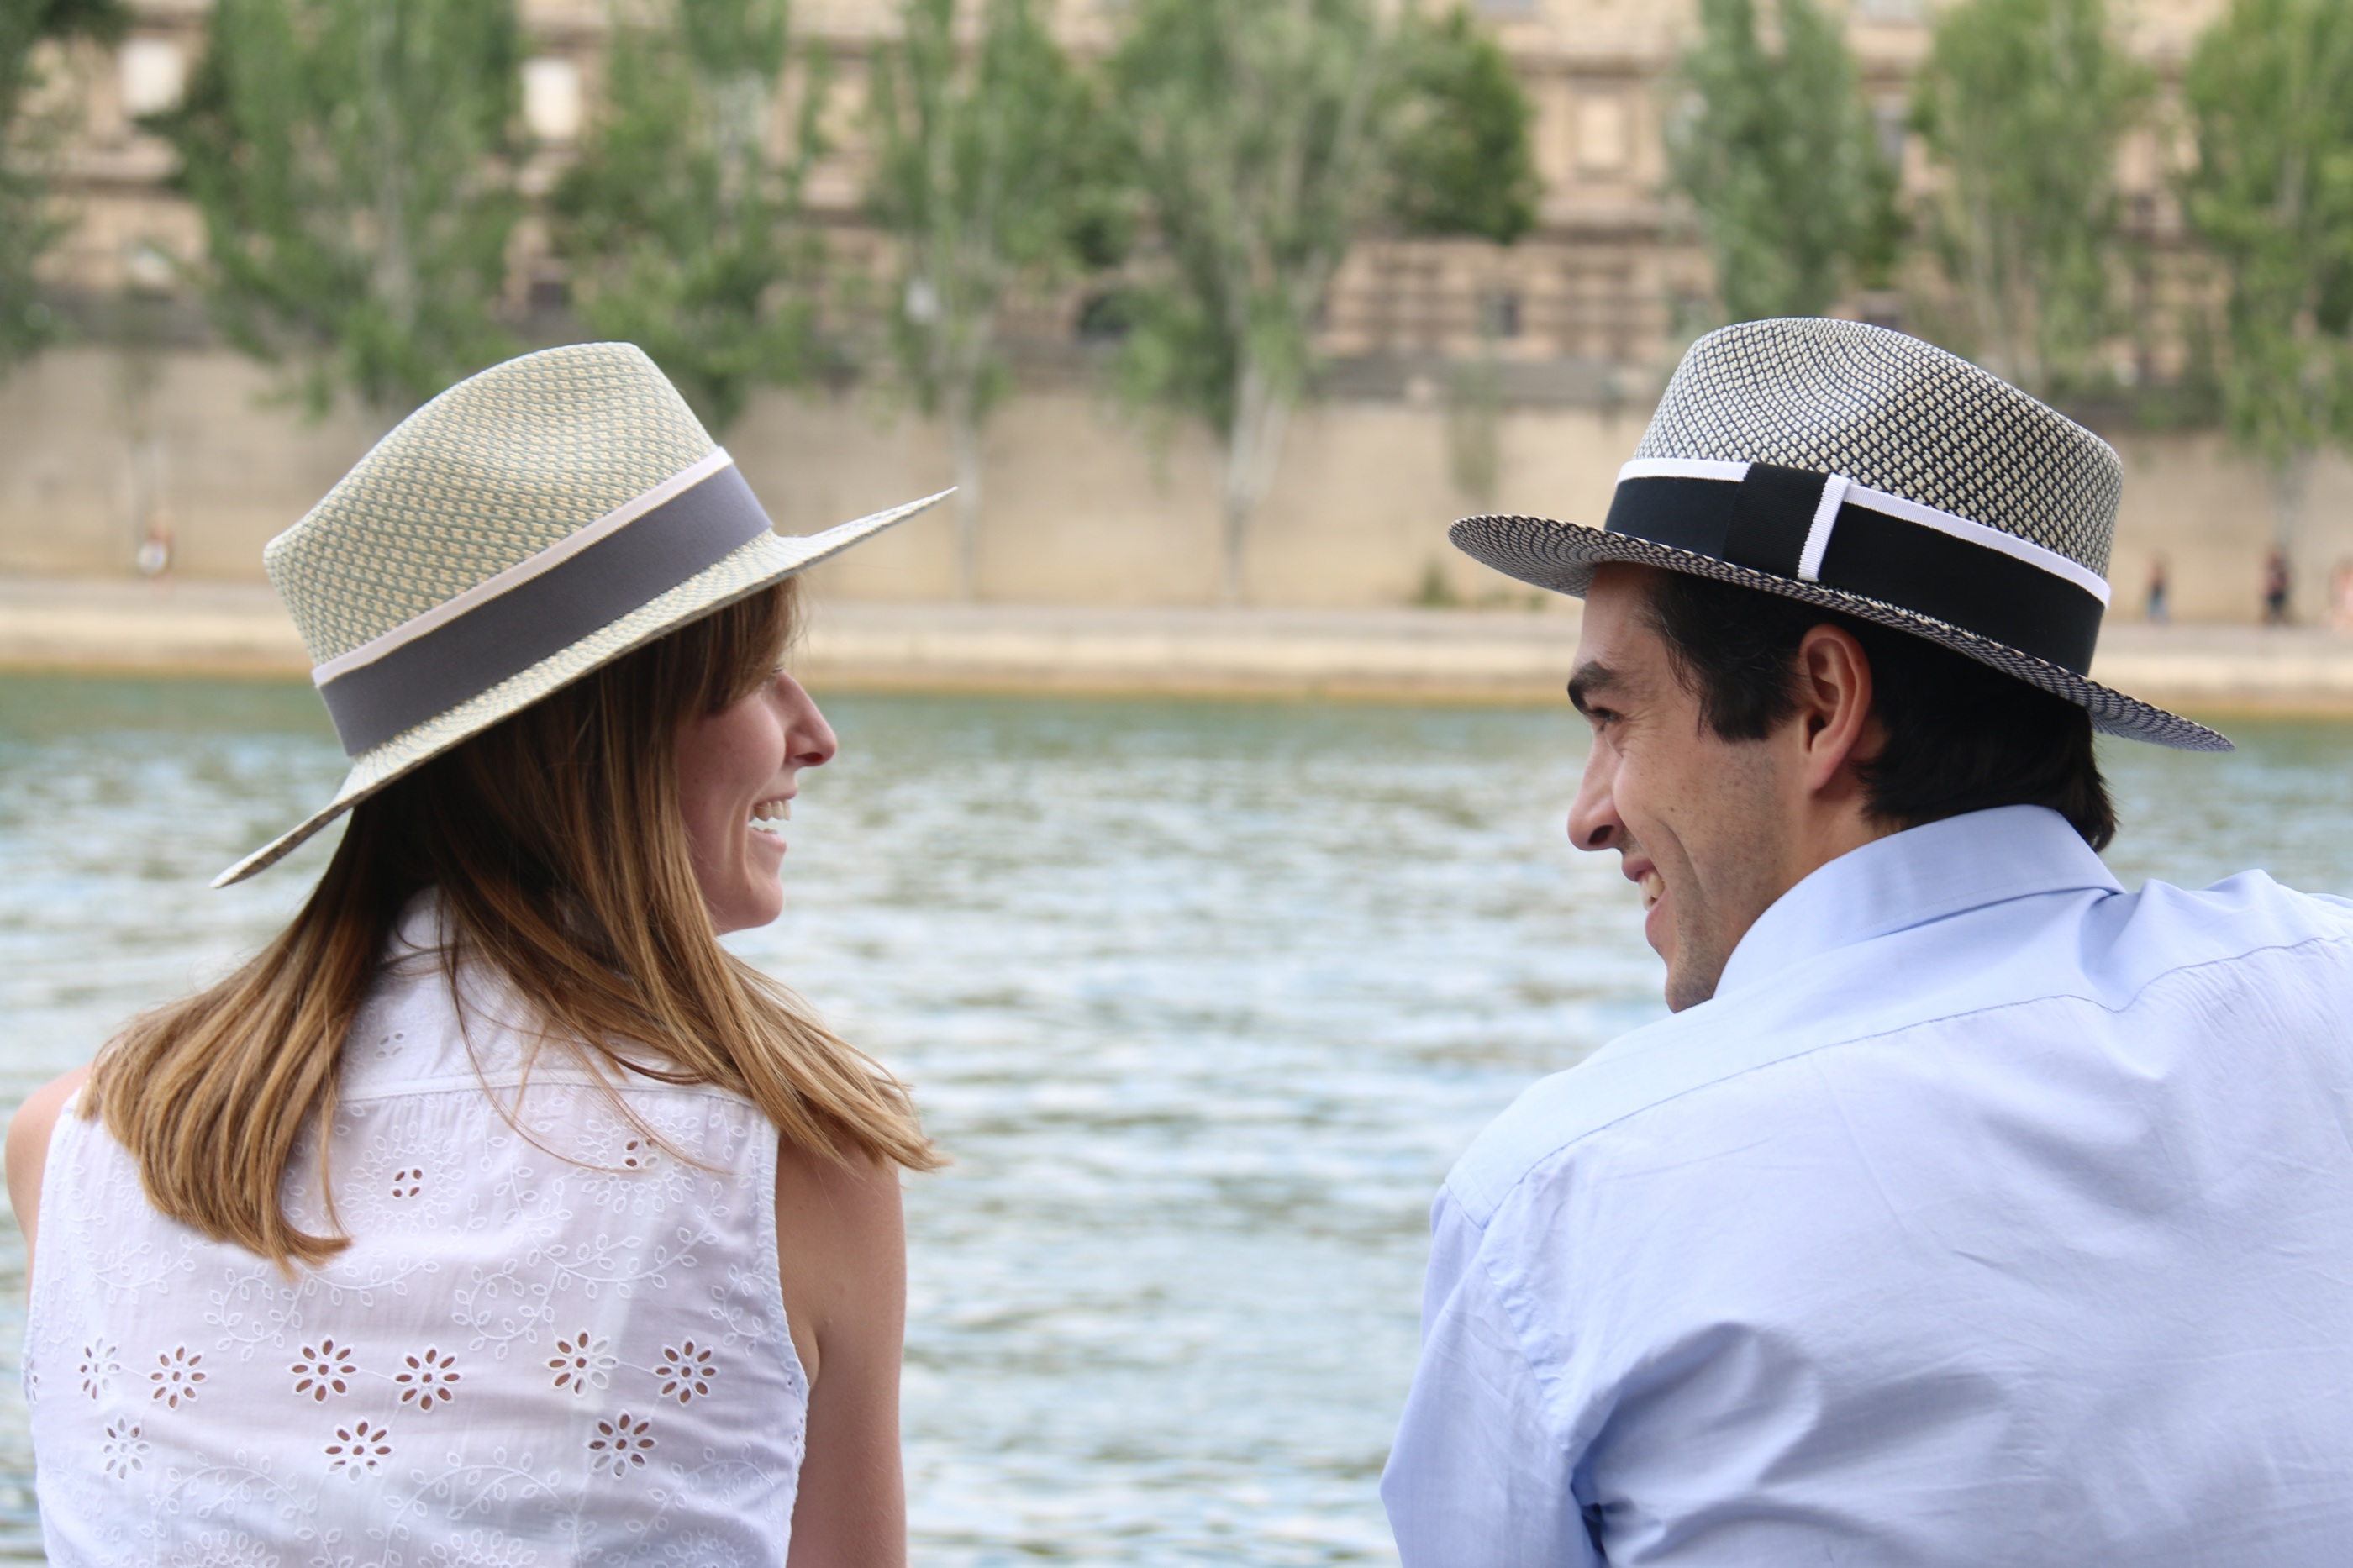 chapeau-panama-capferret-duo-2-1800x1200